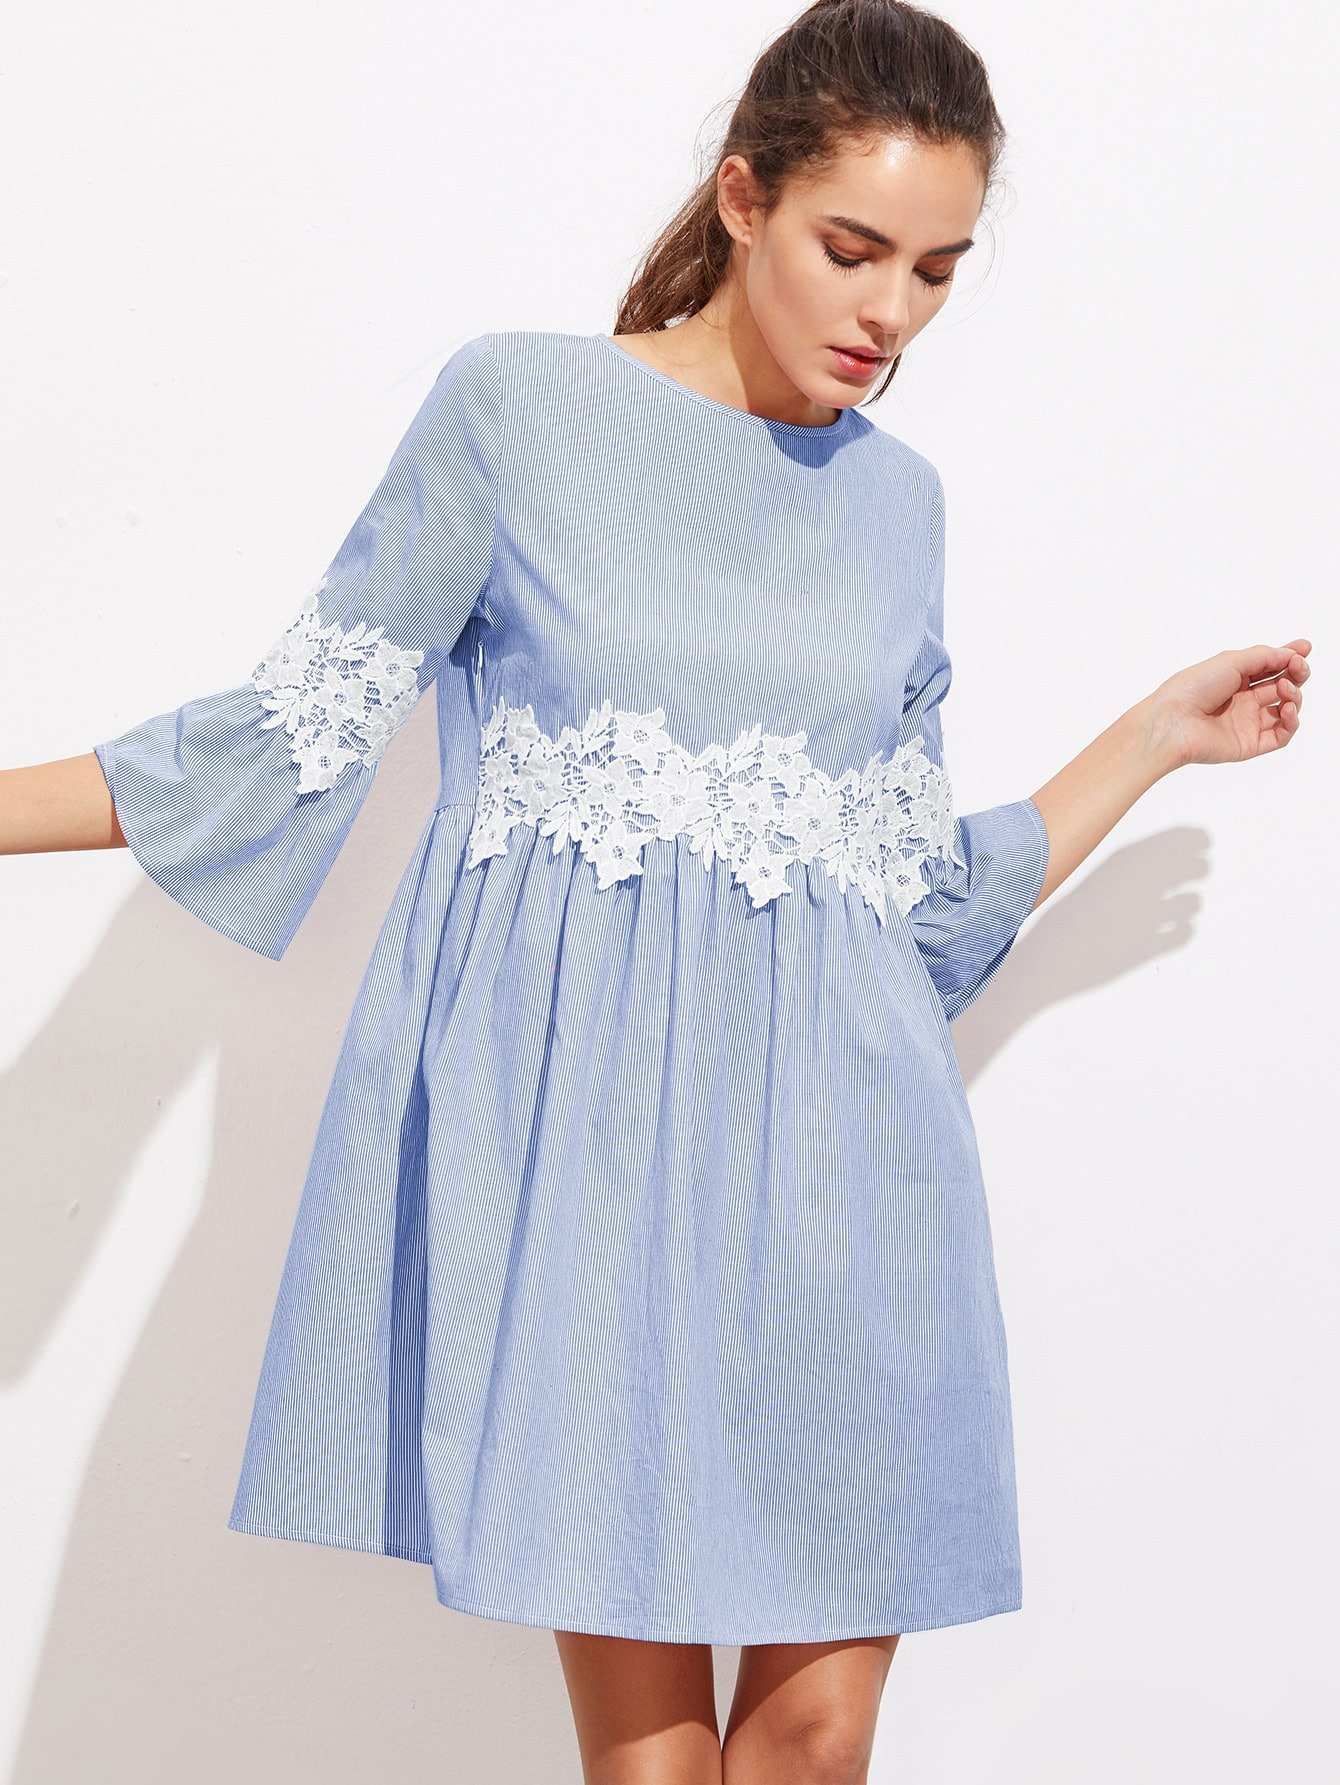 все цены на  Floral Lace Applique Fluted Sleeve Striped Smock Dress  онлайн